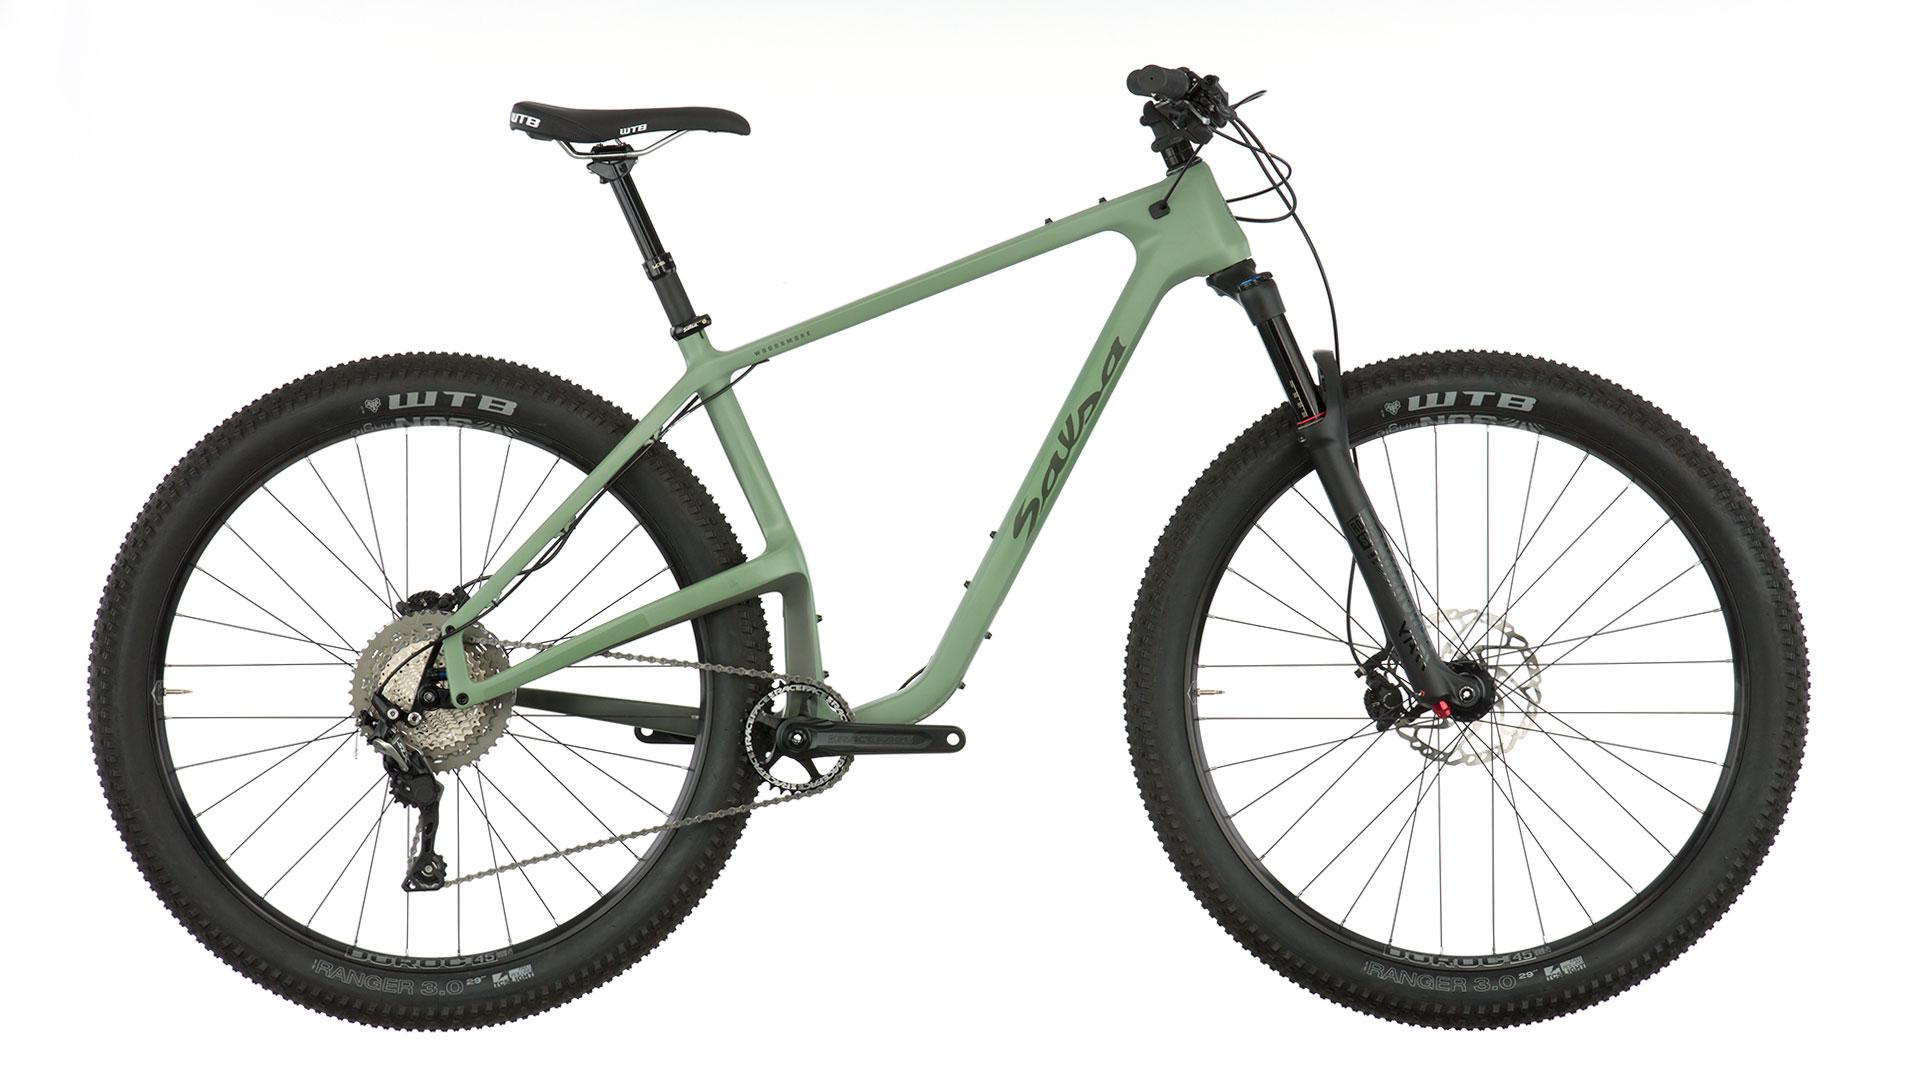 Salsa bikepacking fietsen, 2018 updates